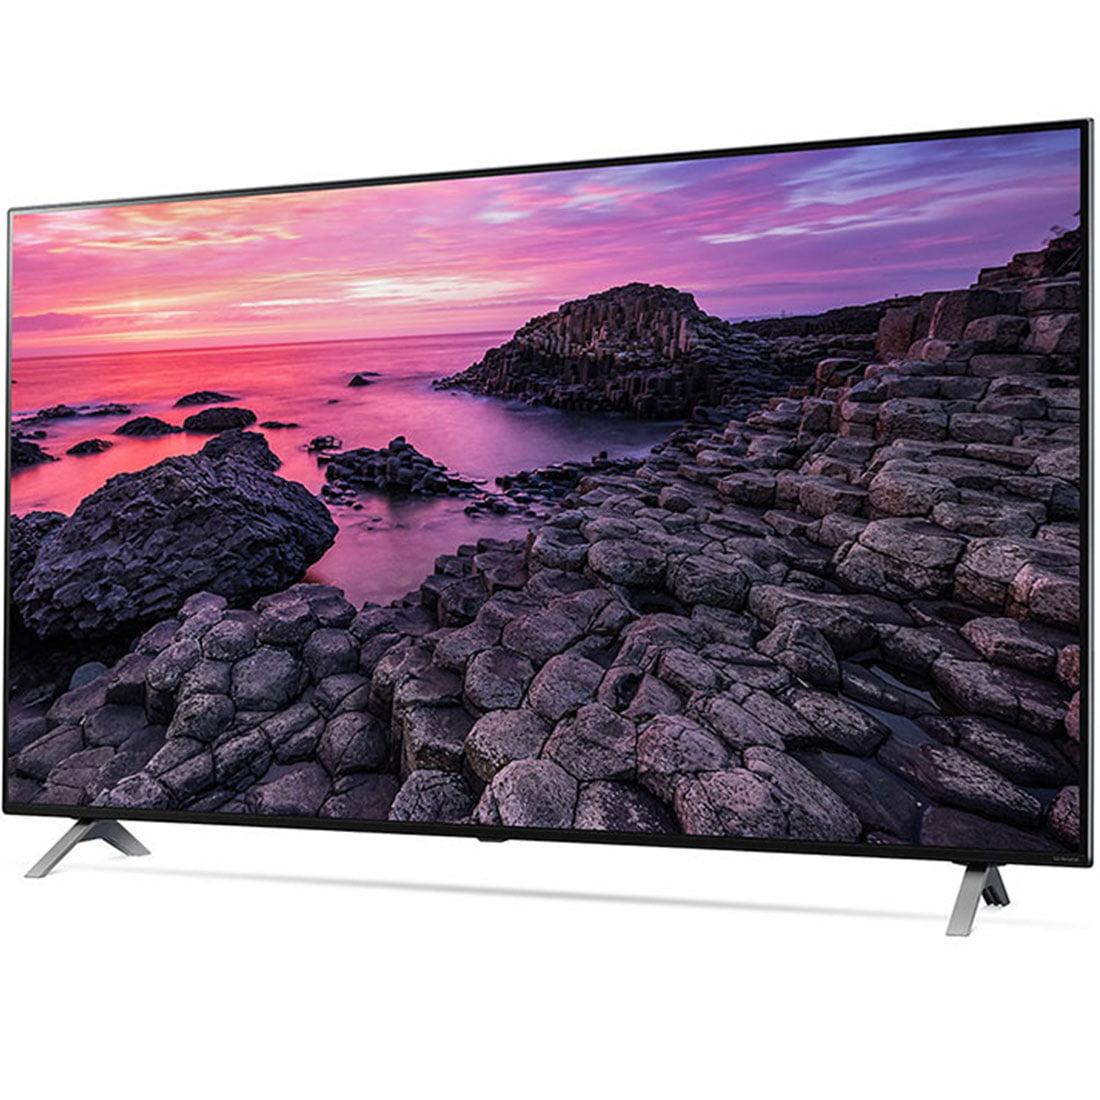 LG 65NANO90UNA 65″ Class 4K Smart UHD NanoCell TV w/ AI ThinQ